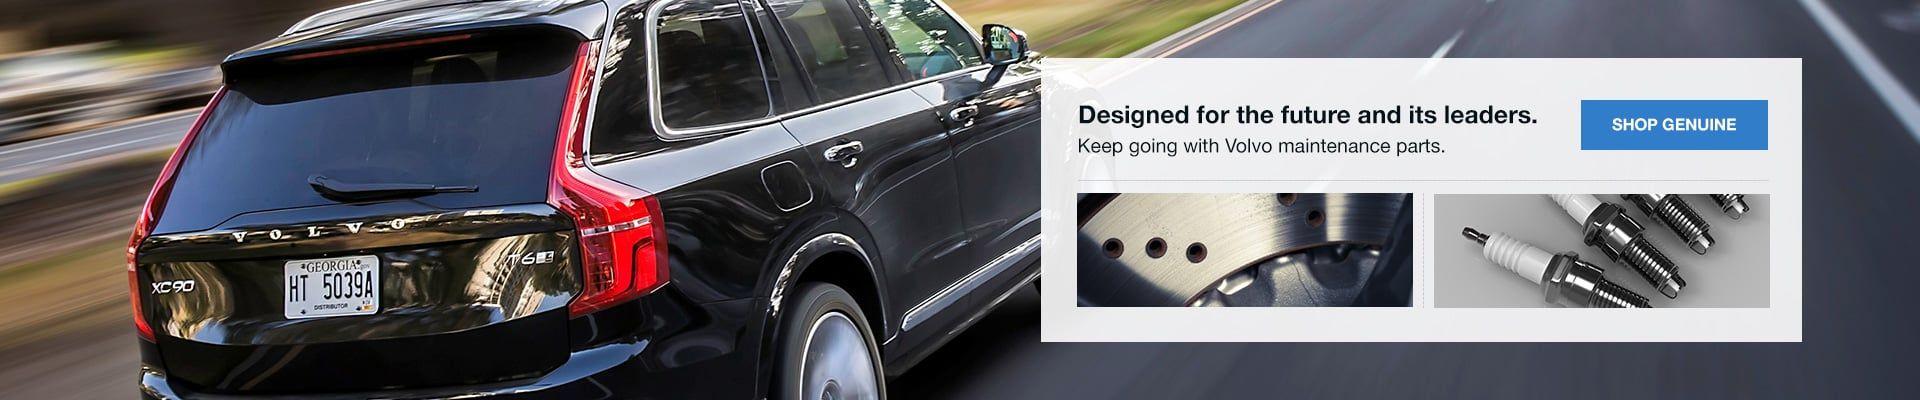 Volvo Maintenance Parts